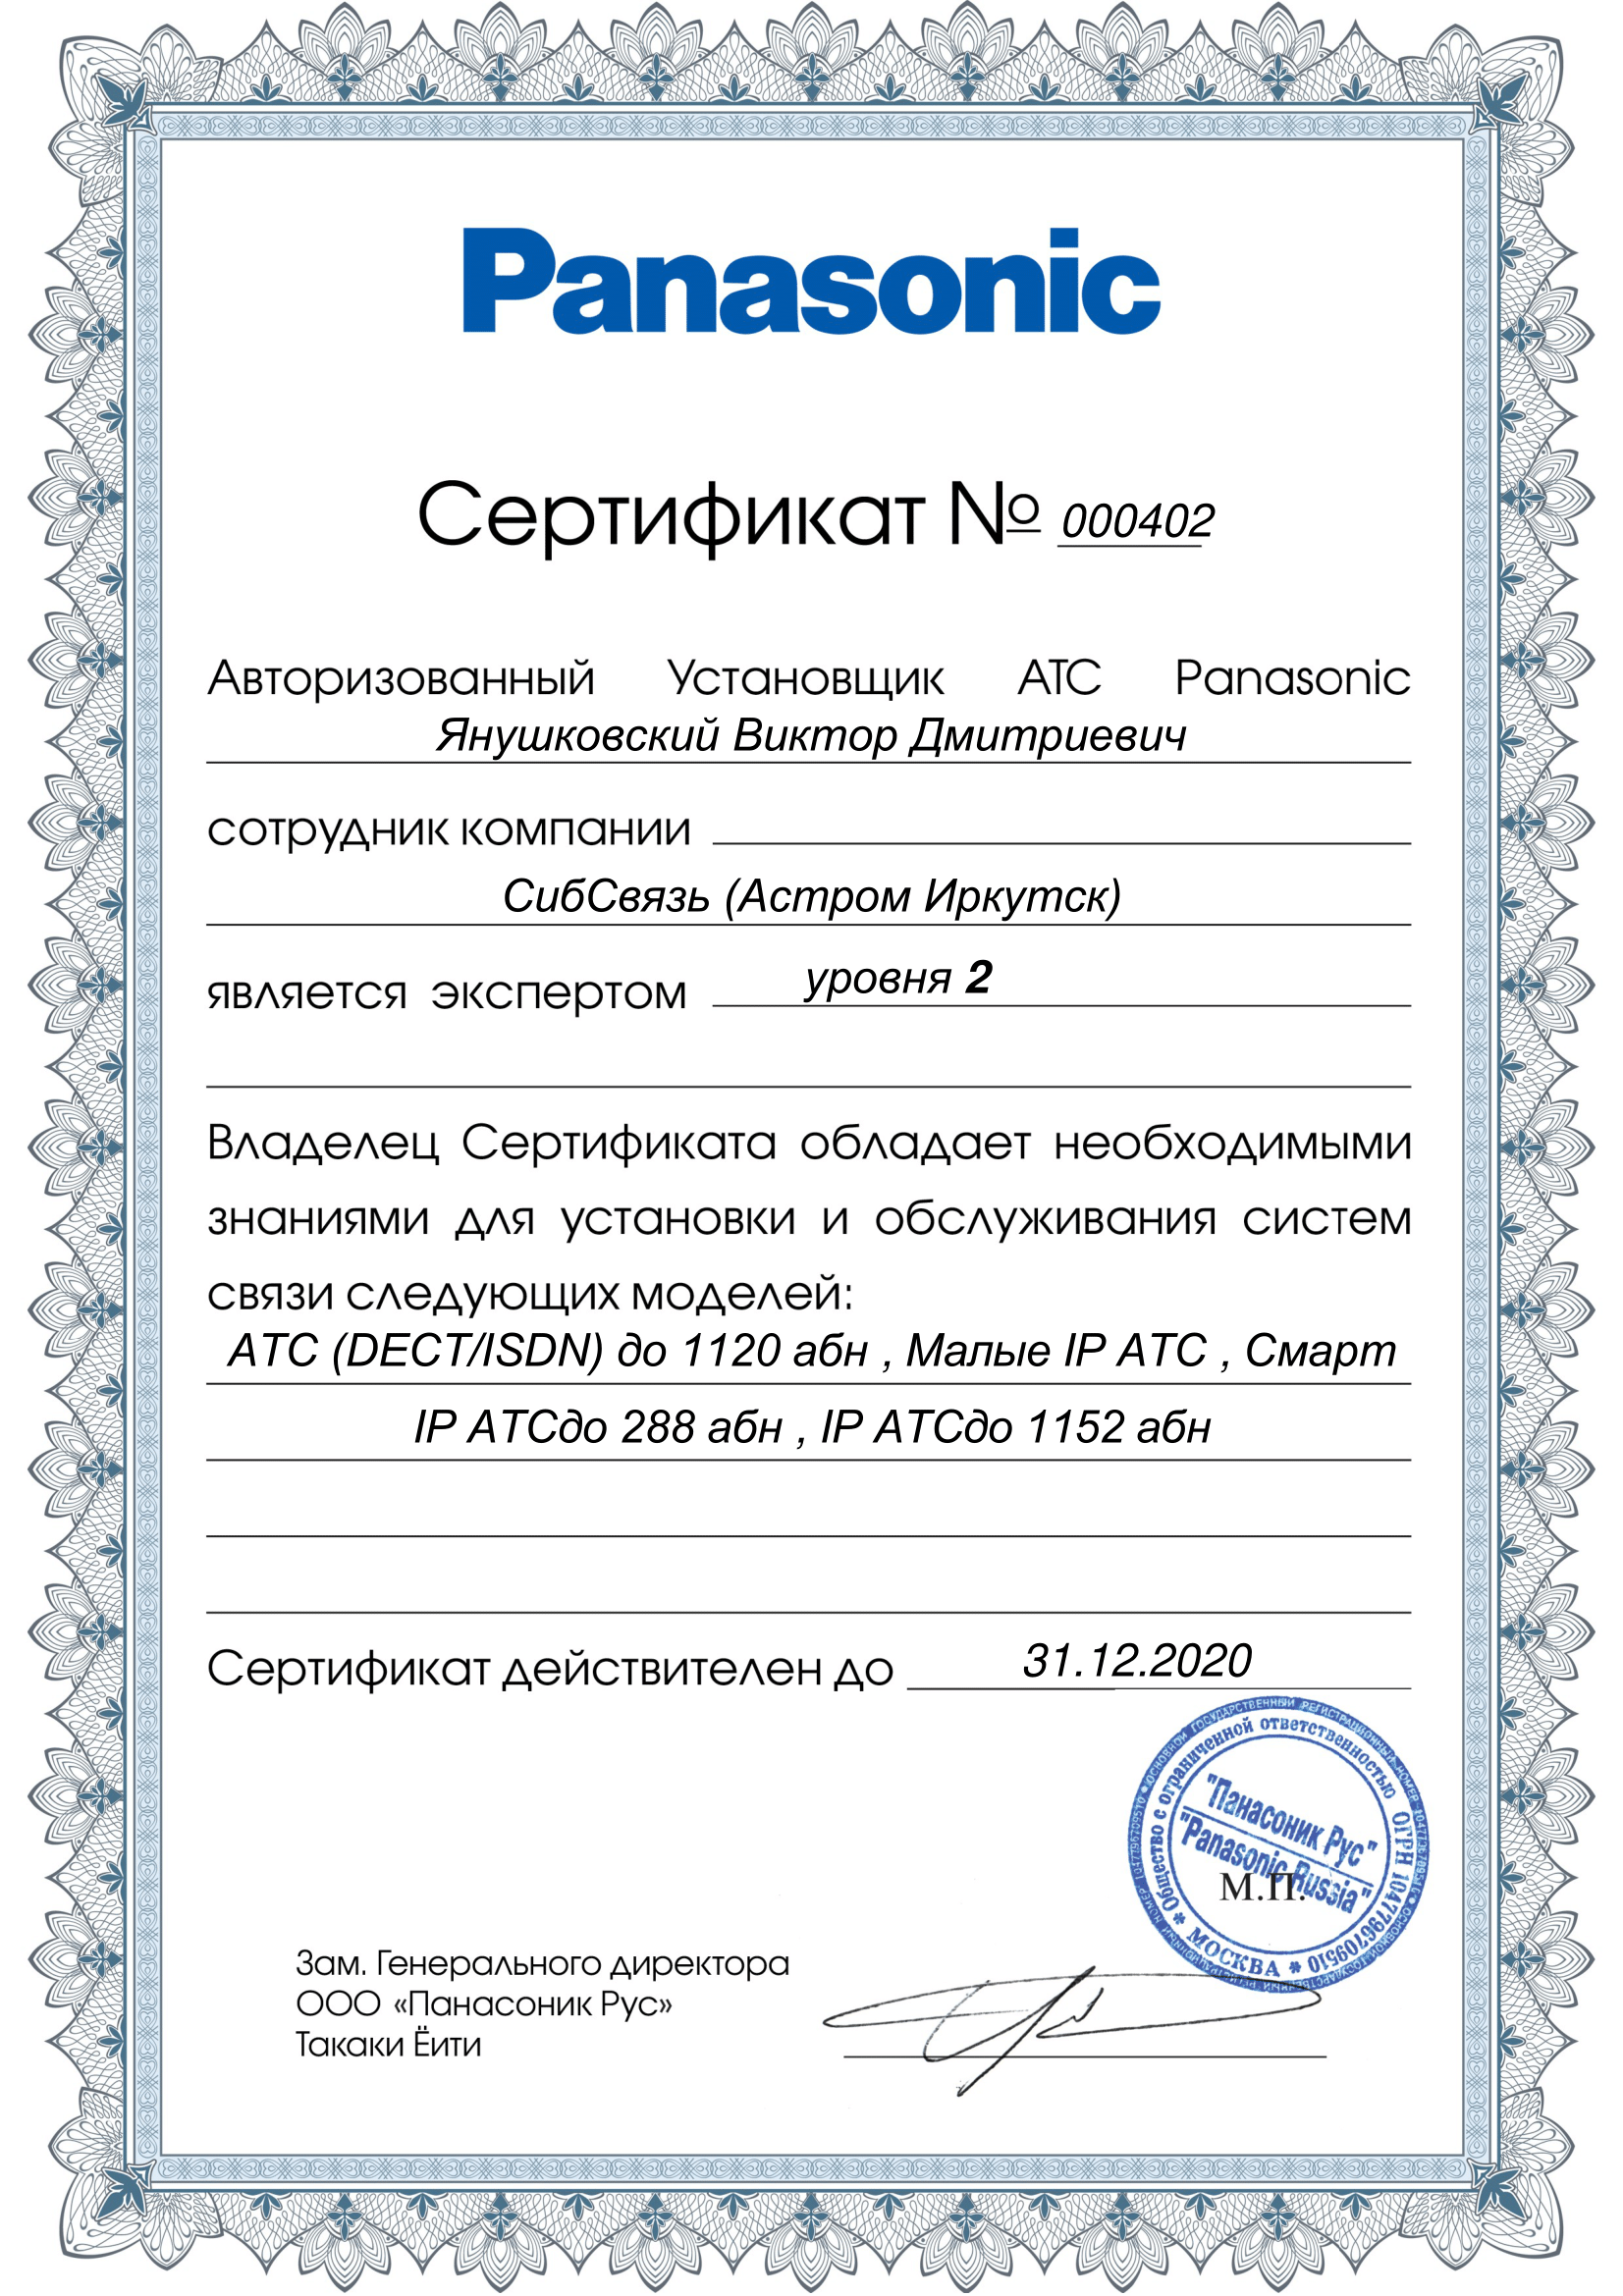 000402-1